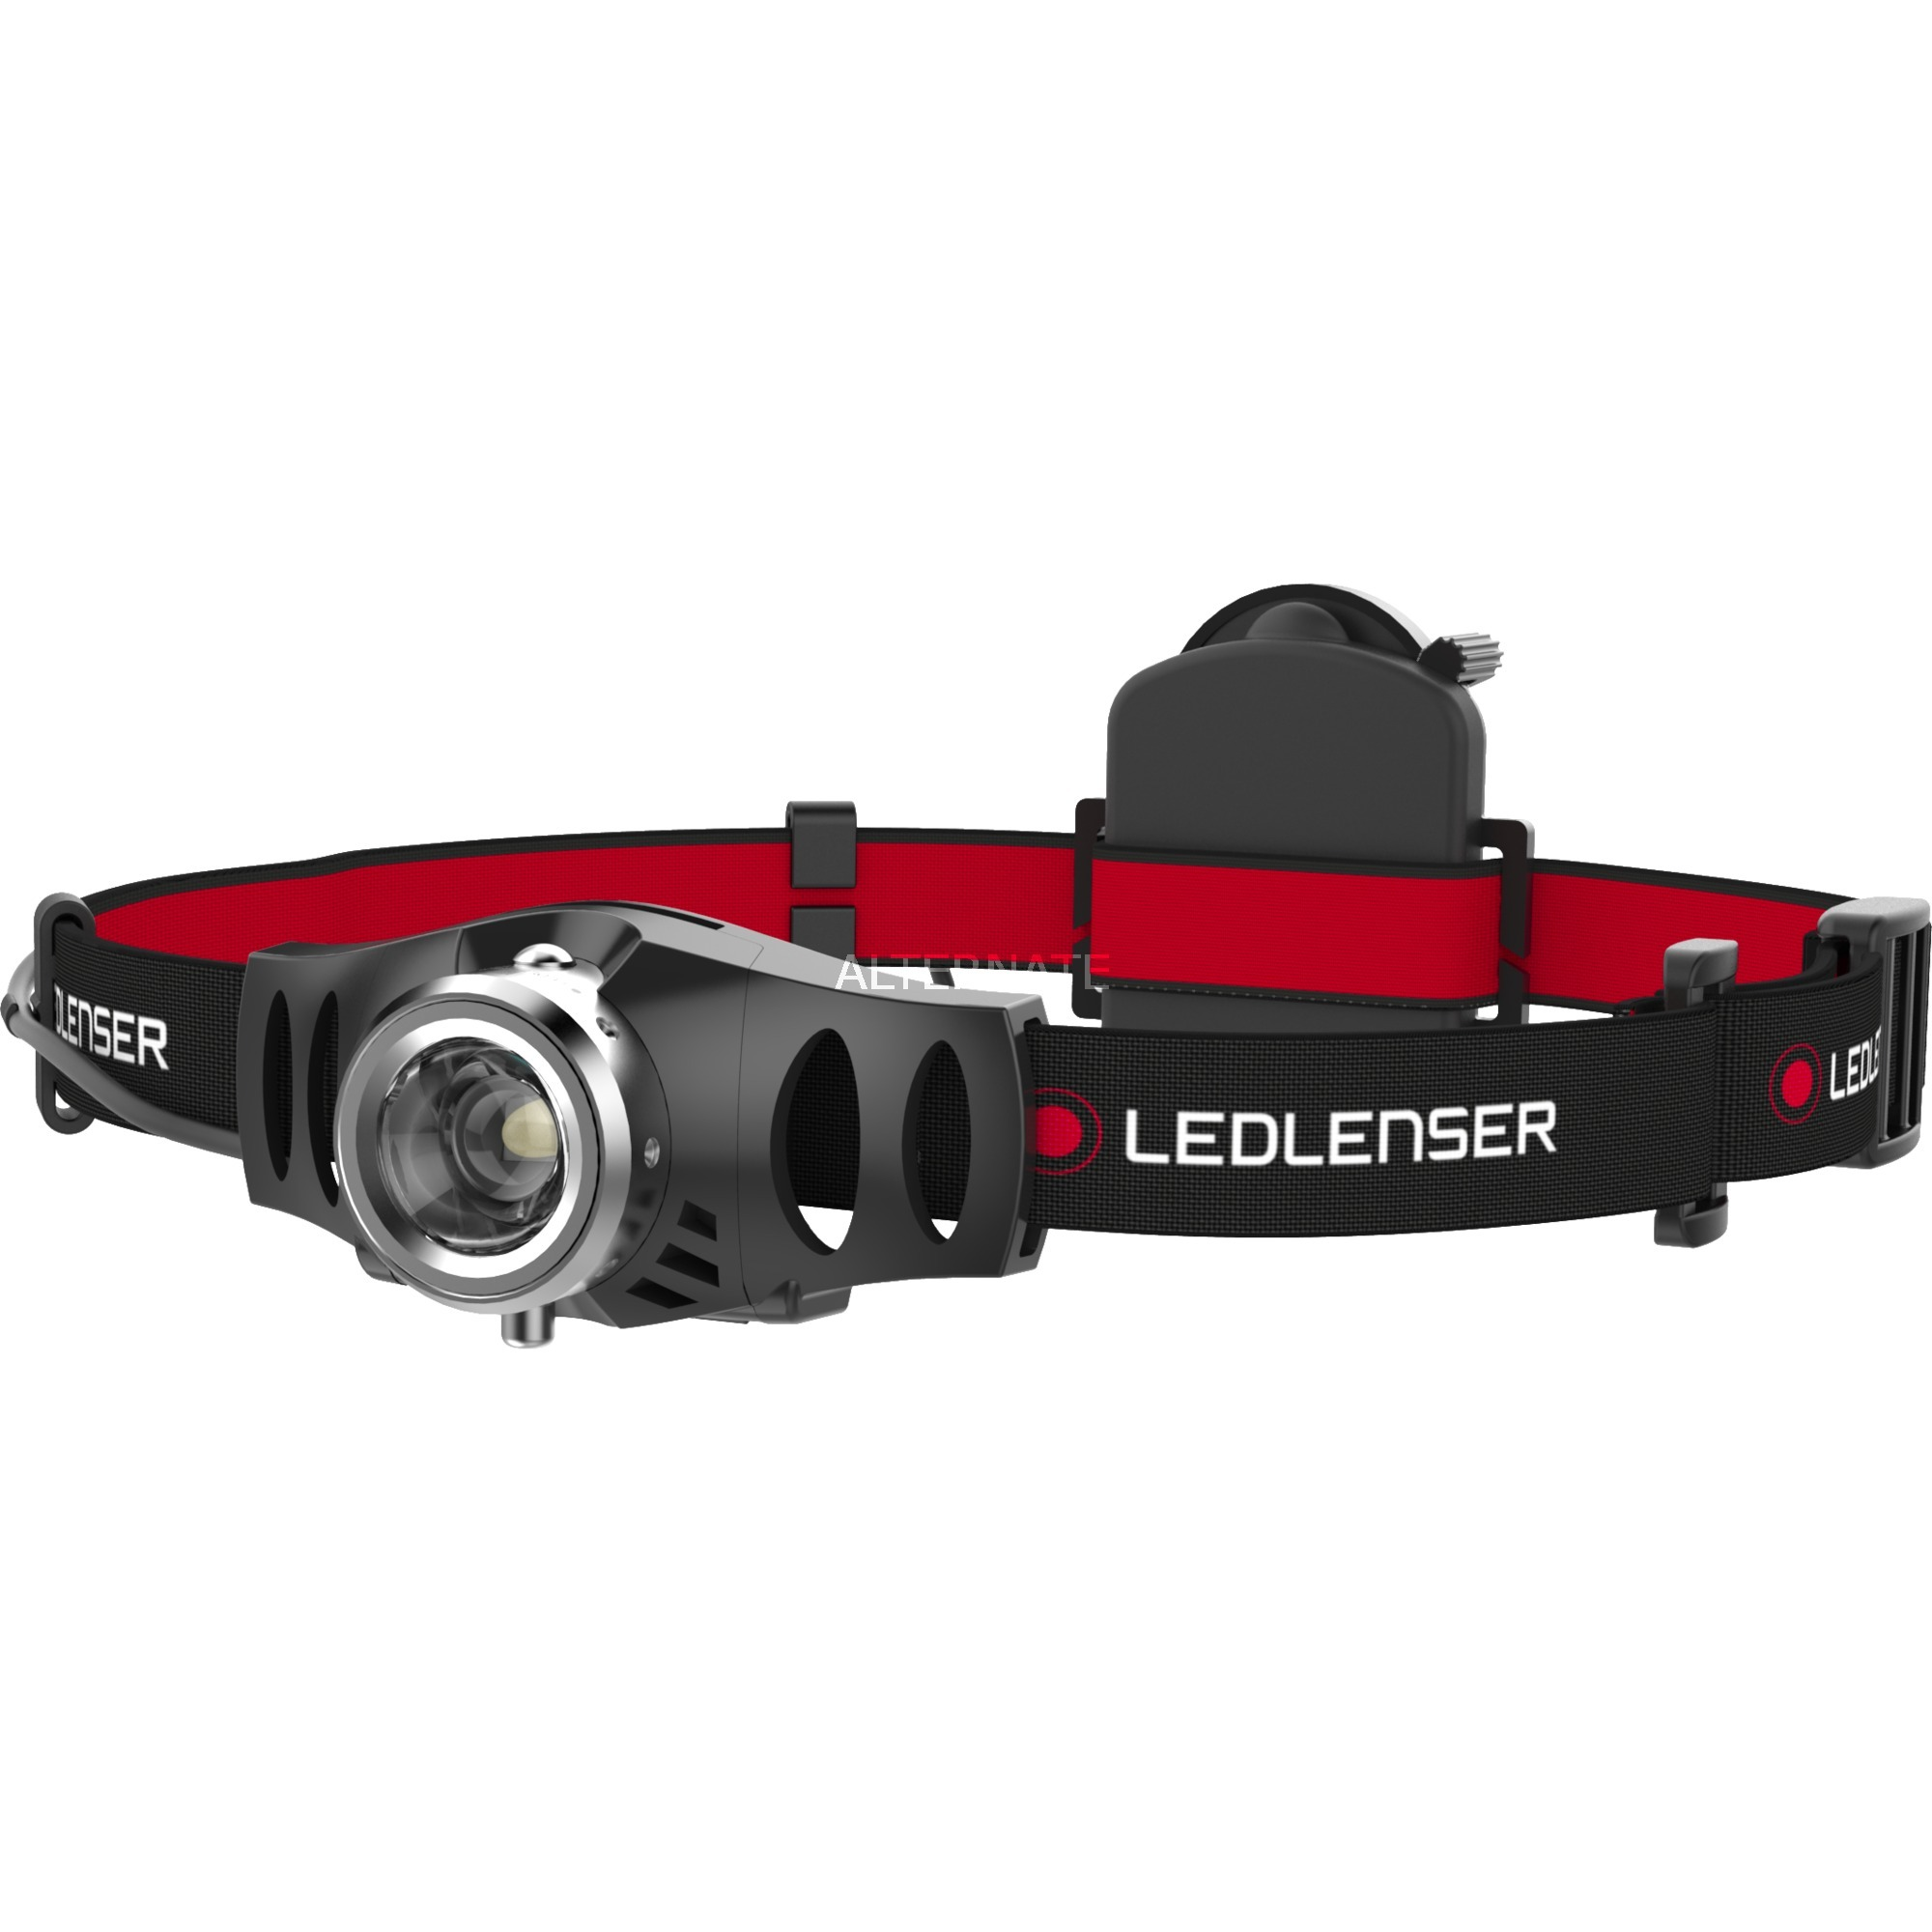 H3.2 Lampe frontale LED, Lampe à LED